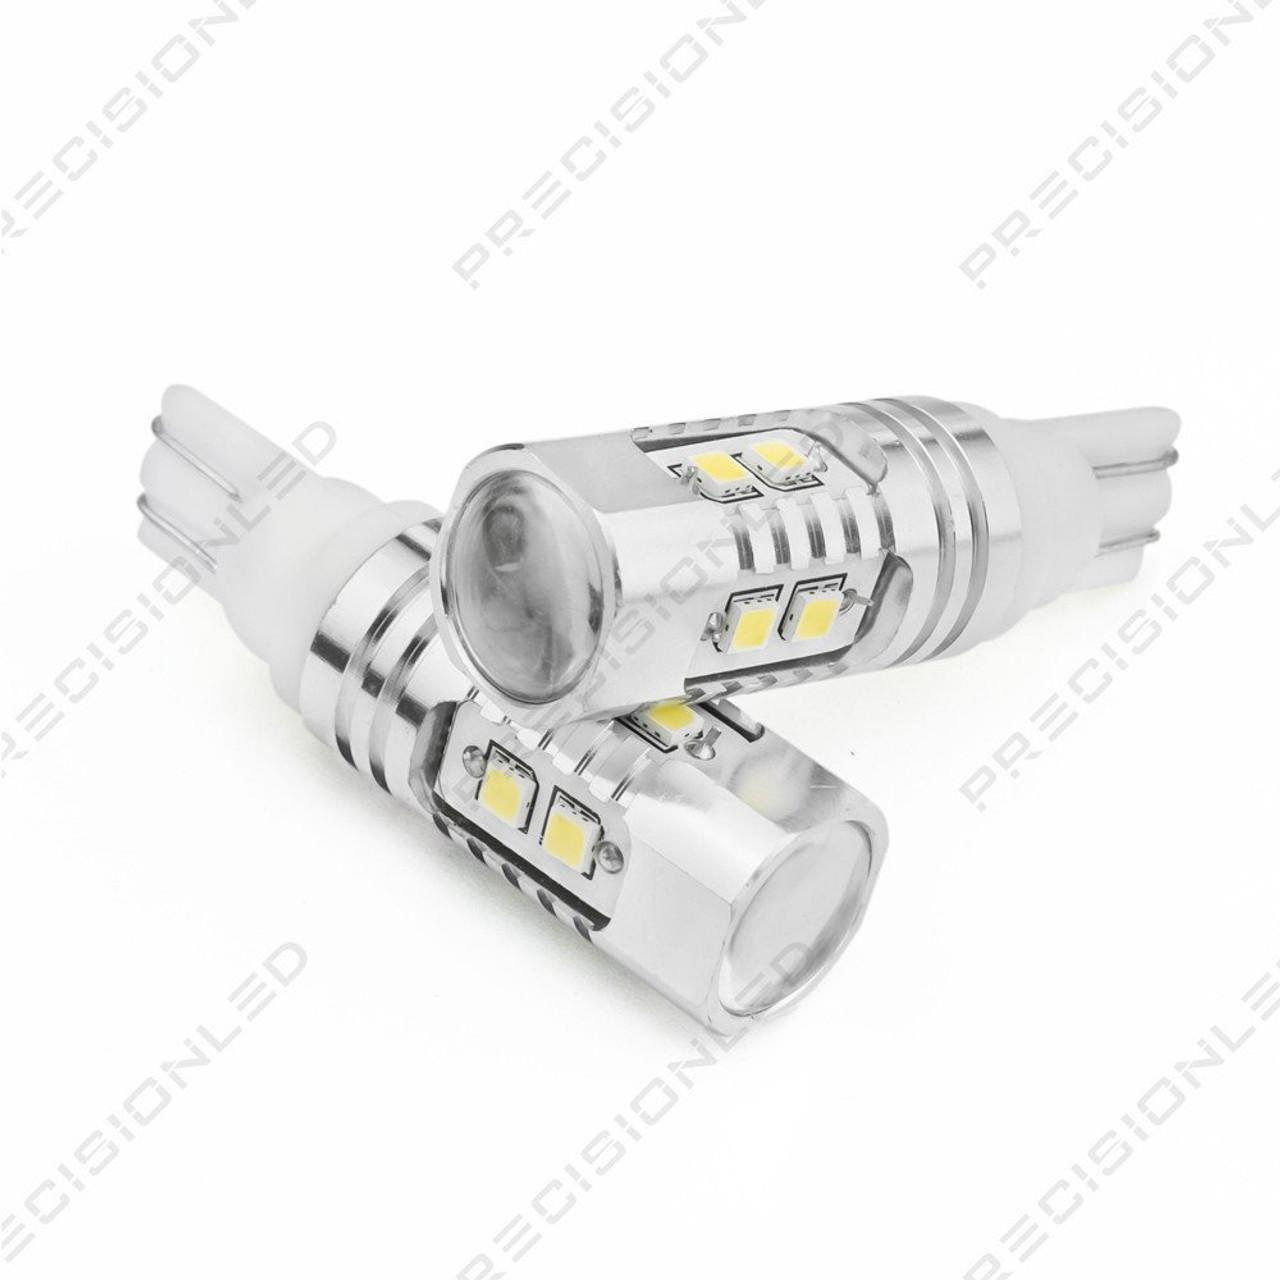 Subaru Legacy Wagon LED Backup Reverse Lights (2004-2009)